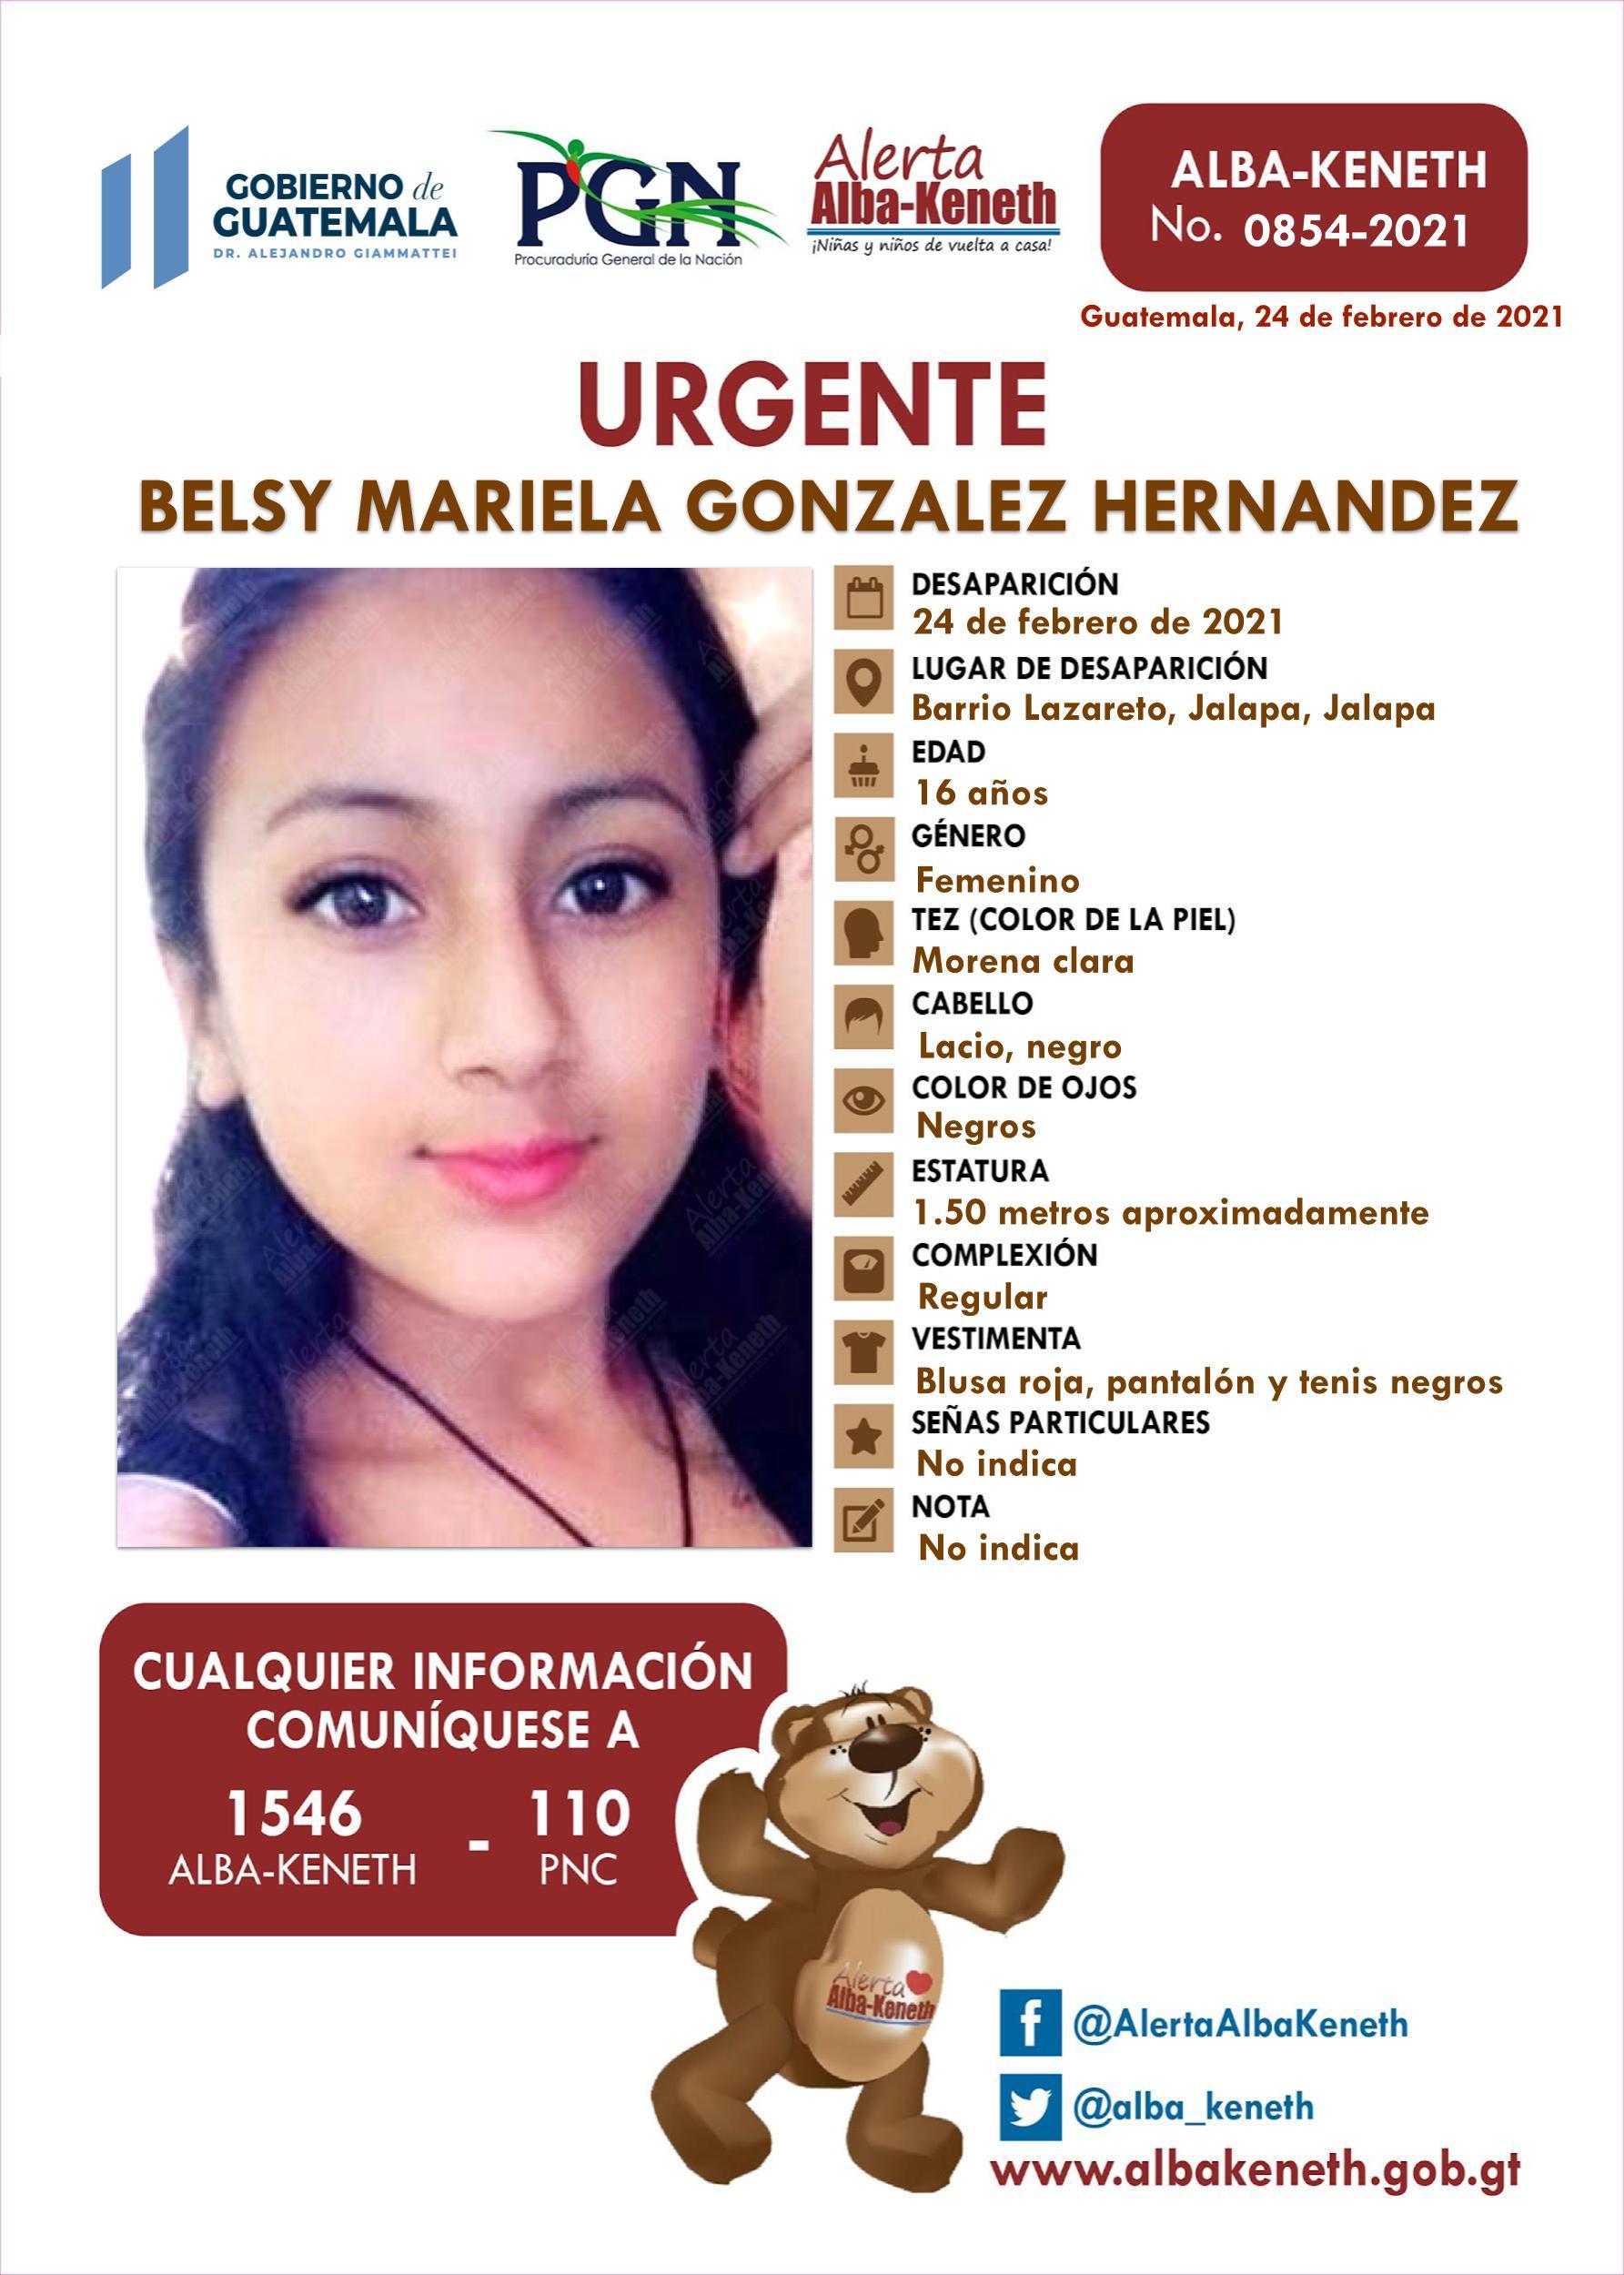 Belsy Mariela Gonzalez Hernandez